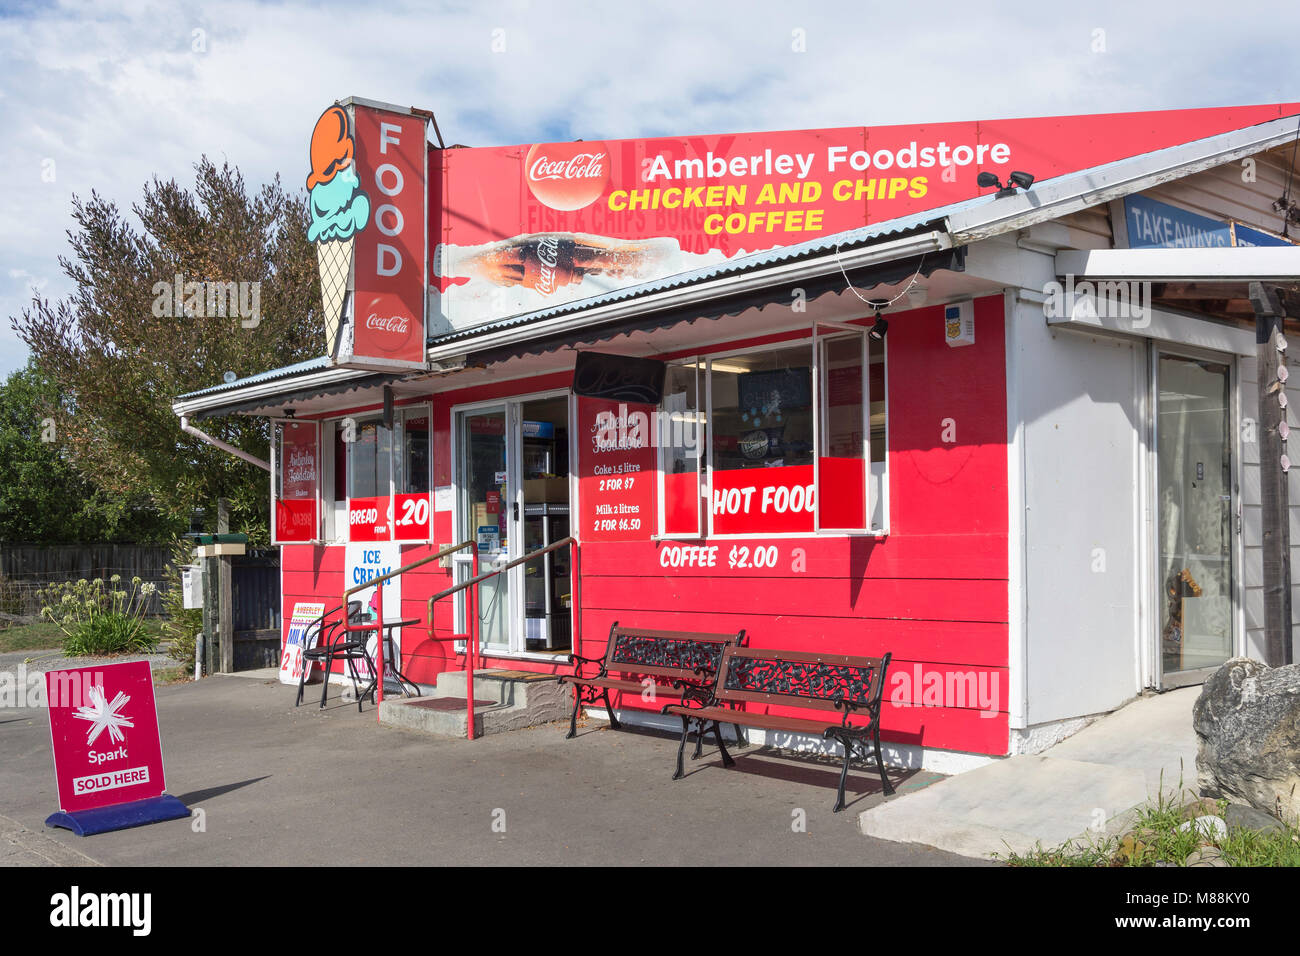 Amberley Dairy Foodstore, Autostrada statale 1, Amberley, regione di Canterbury, Nuova Zelanda Immagini Stock